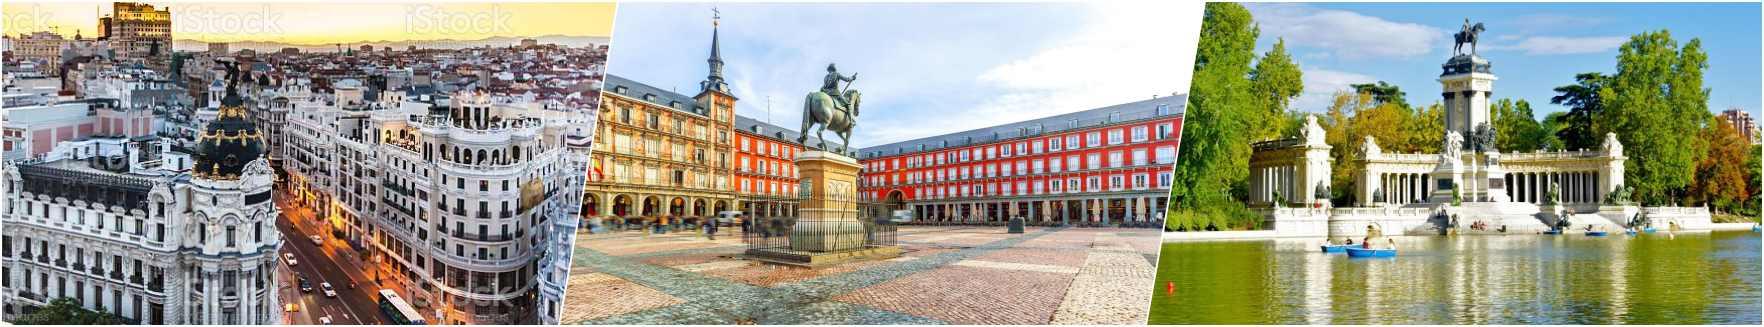 Gran Via Madrid - Plaza Mayor - Retiro Park